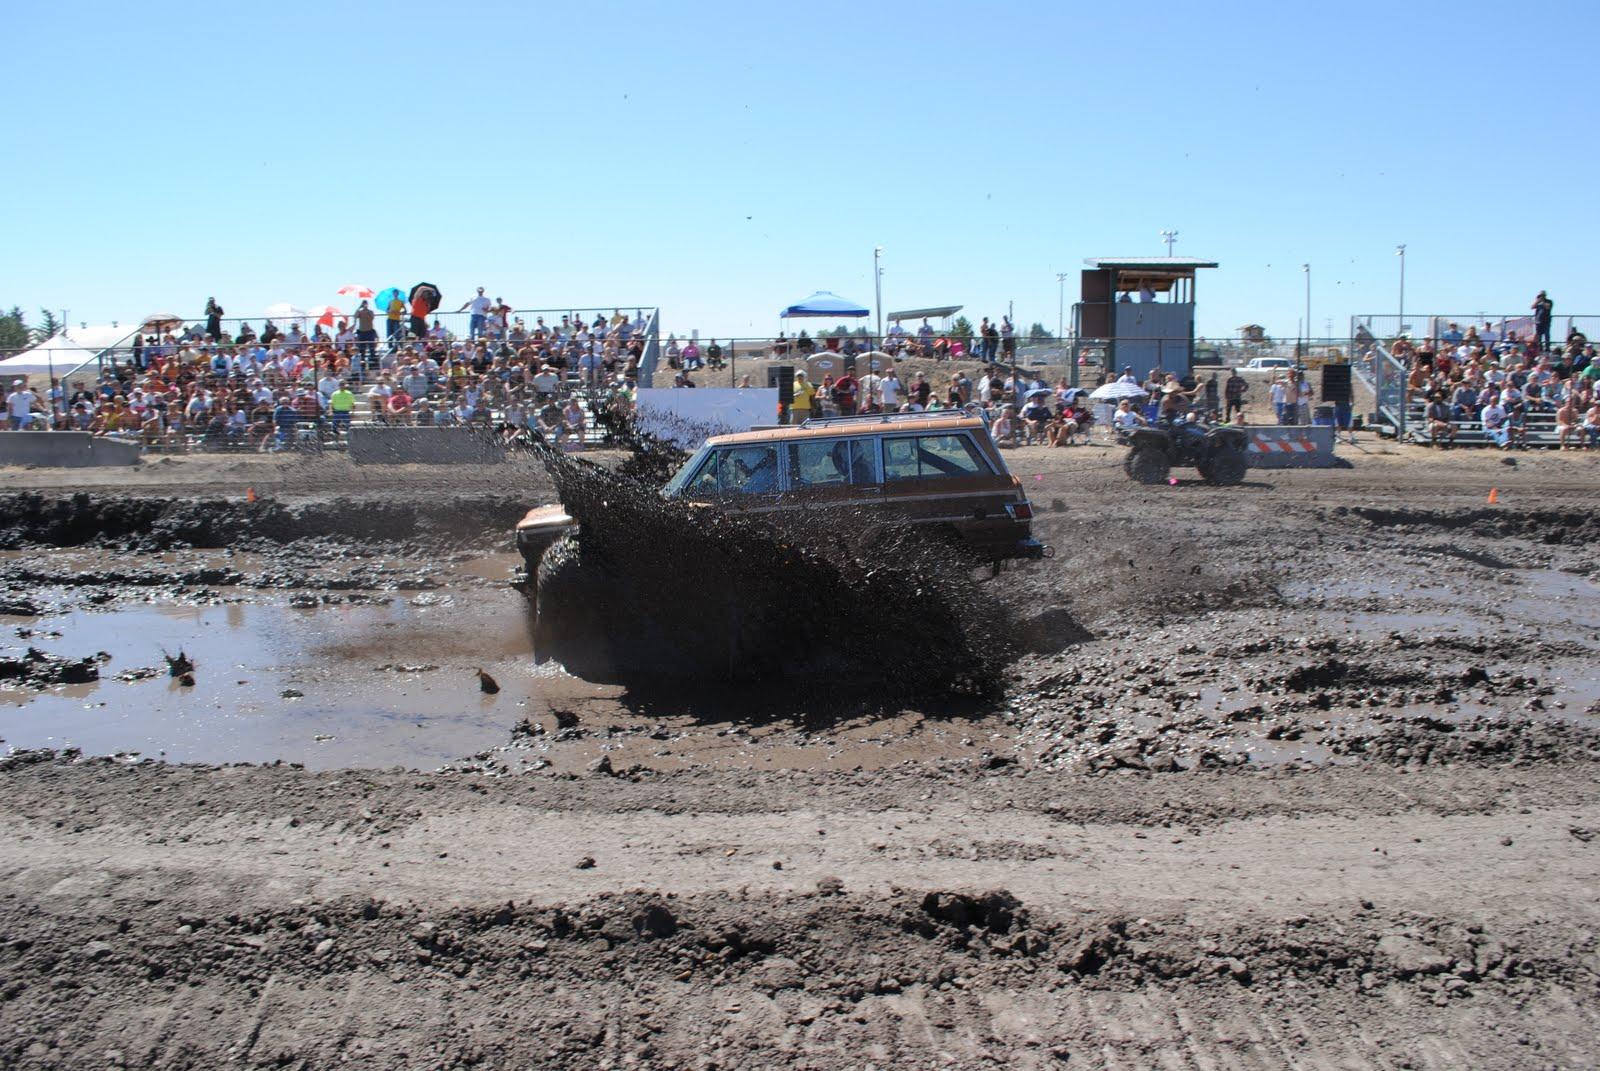 Mud Bogging Dodge Trucks 2010 mud bog